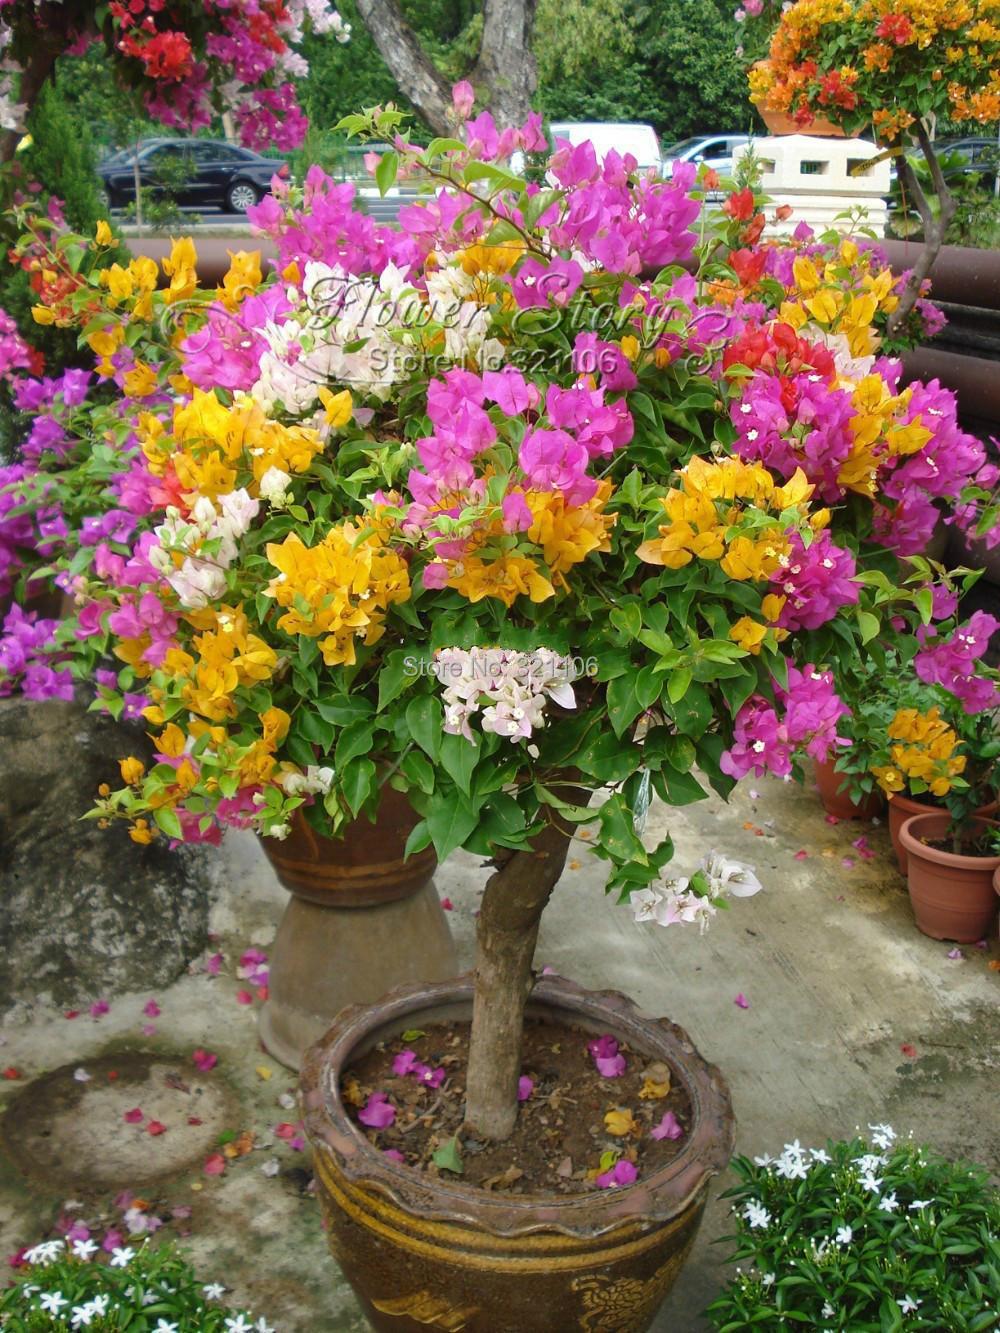 букеты цветов на юбилей из хризантем фото